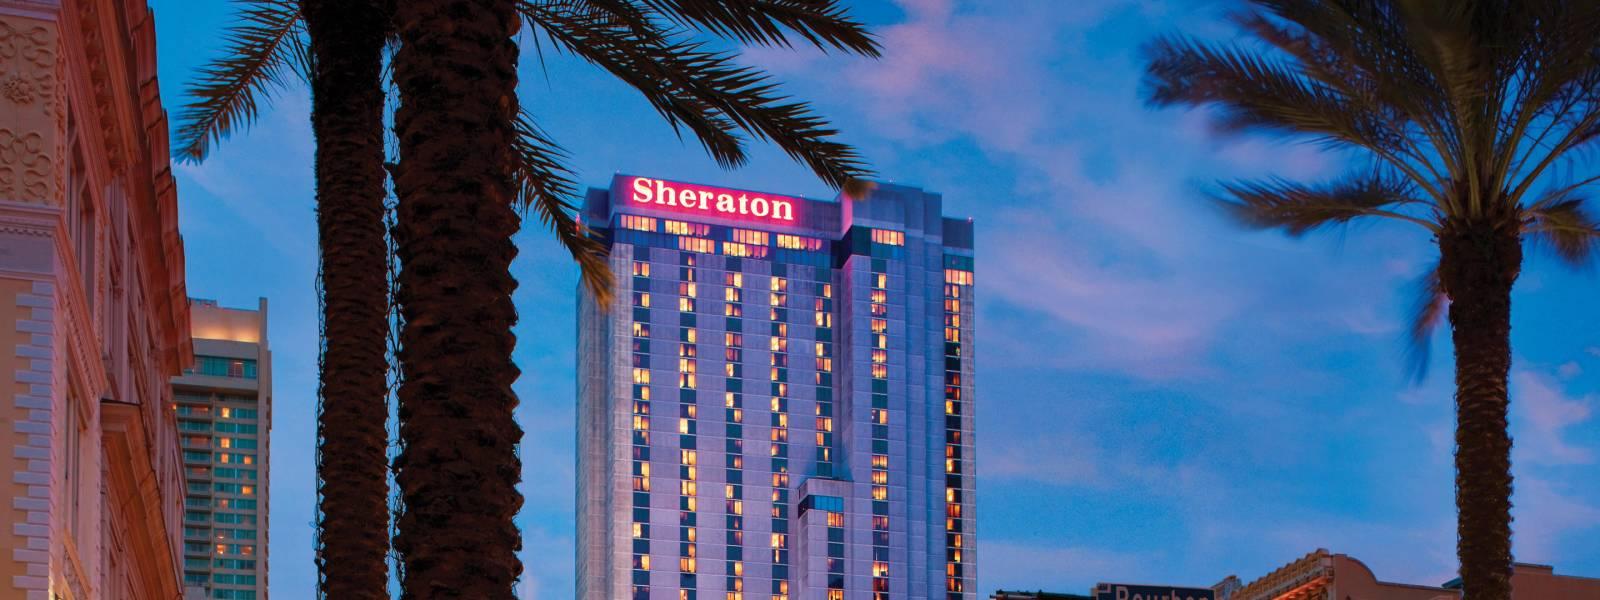 Sheraton New Orleans